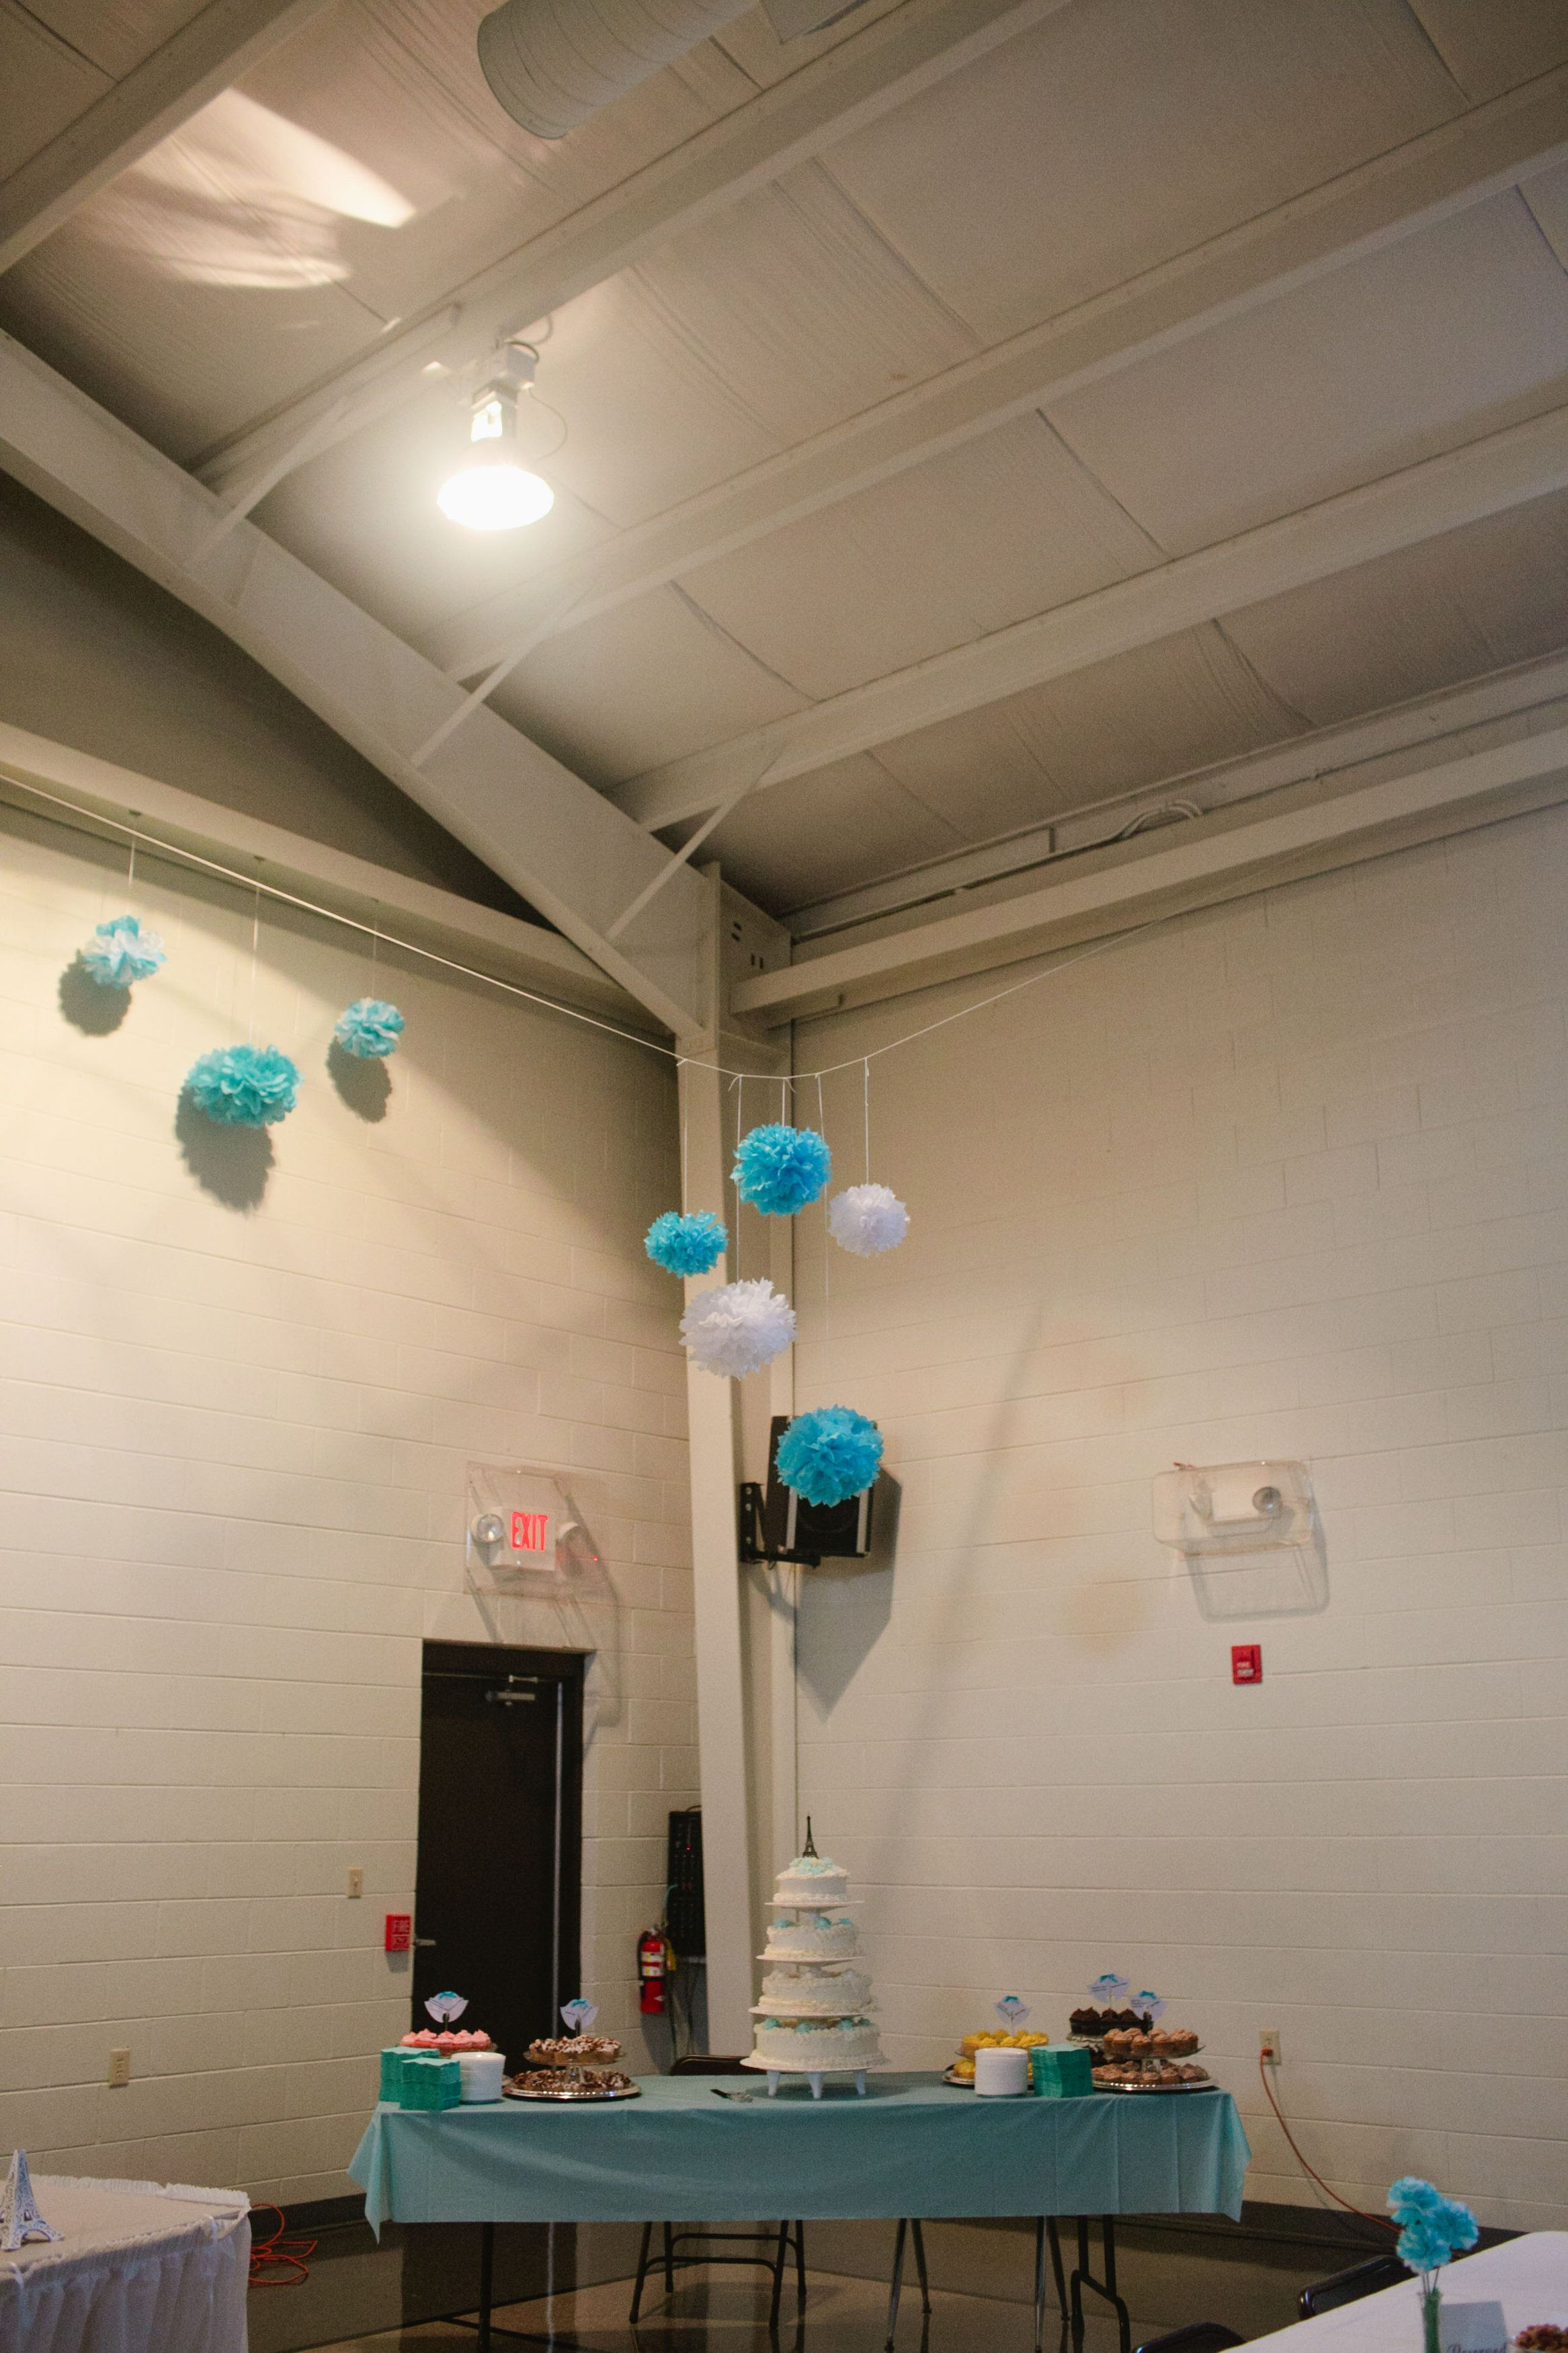 Tissue paper pom-pons above cake table (Maggie & Jeremiah's wedding) #wedding #caketable #tissepaper #pompoms